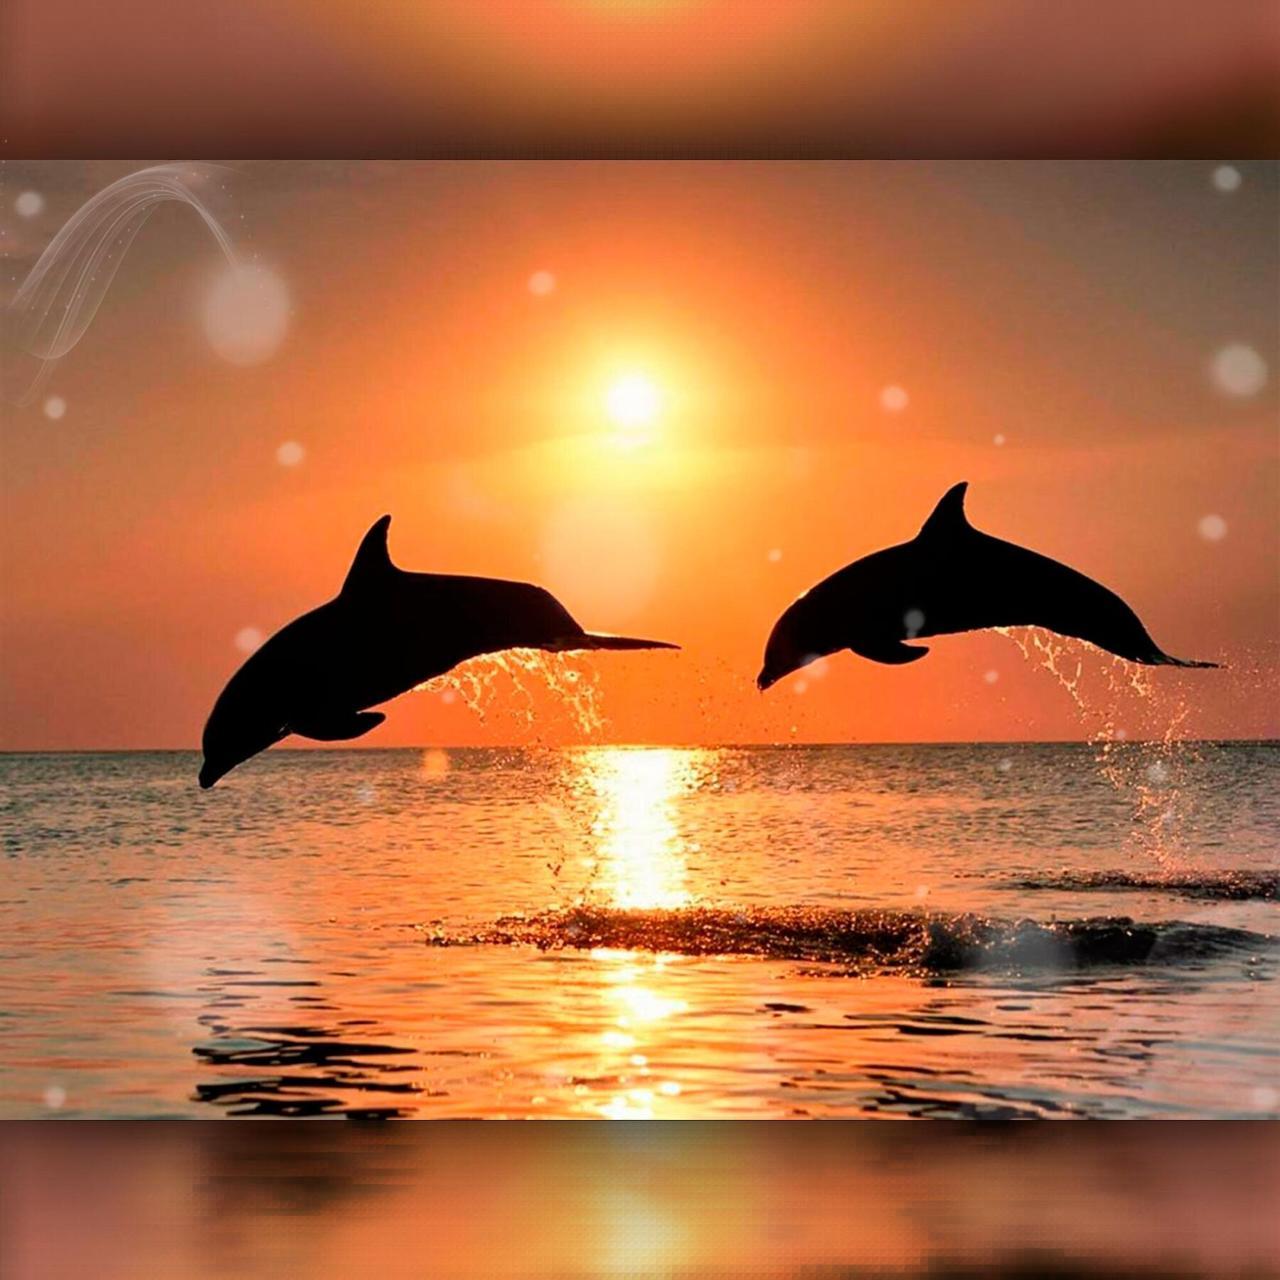 TWD30019 Набор алмазной вышивки Дельфины на закате